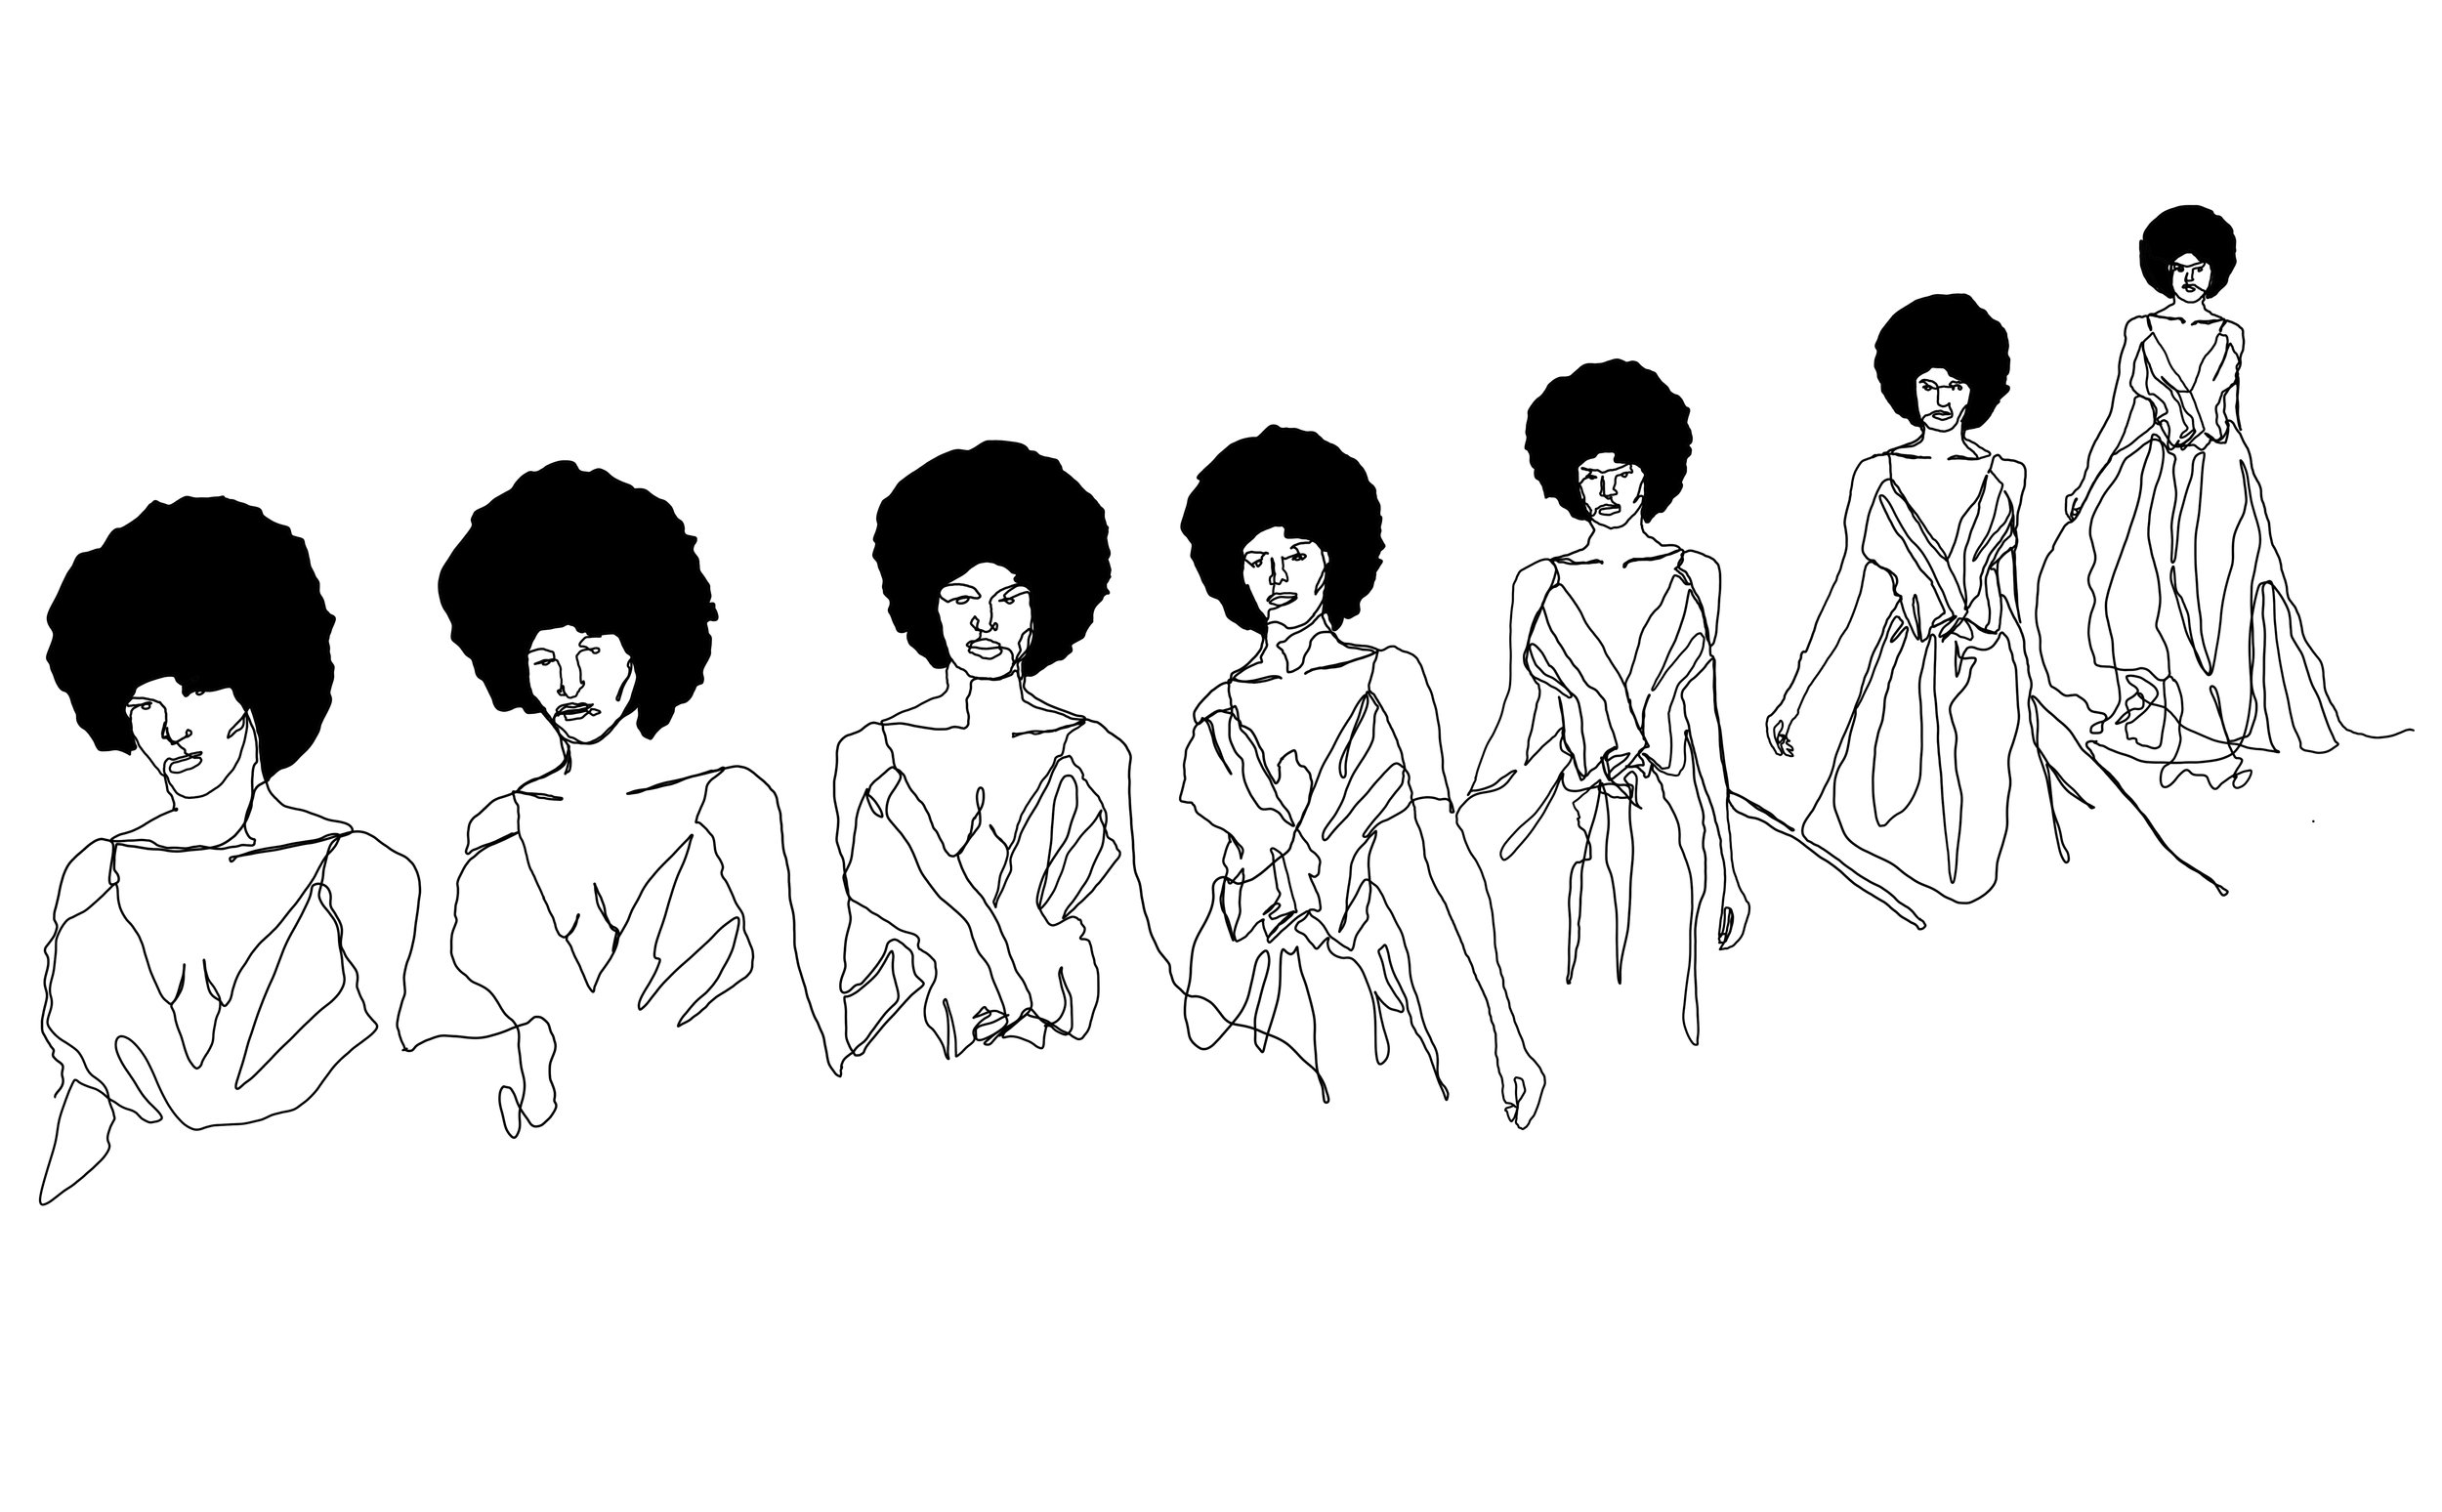 An Illustration of Model and wellness advocate, Tierra Benton